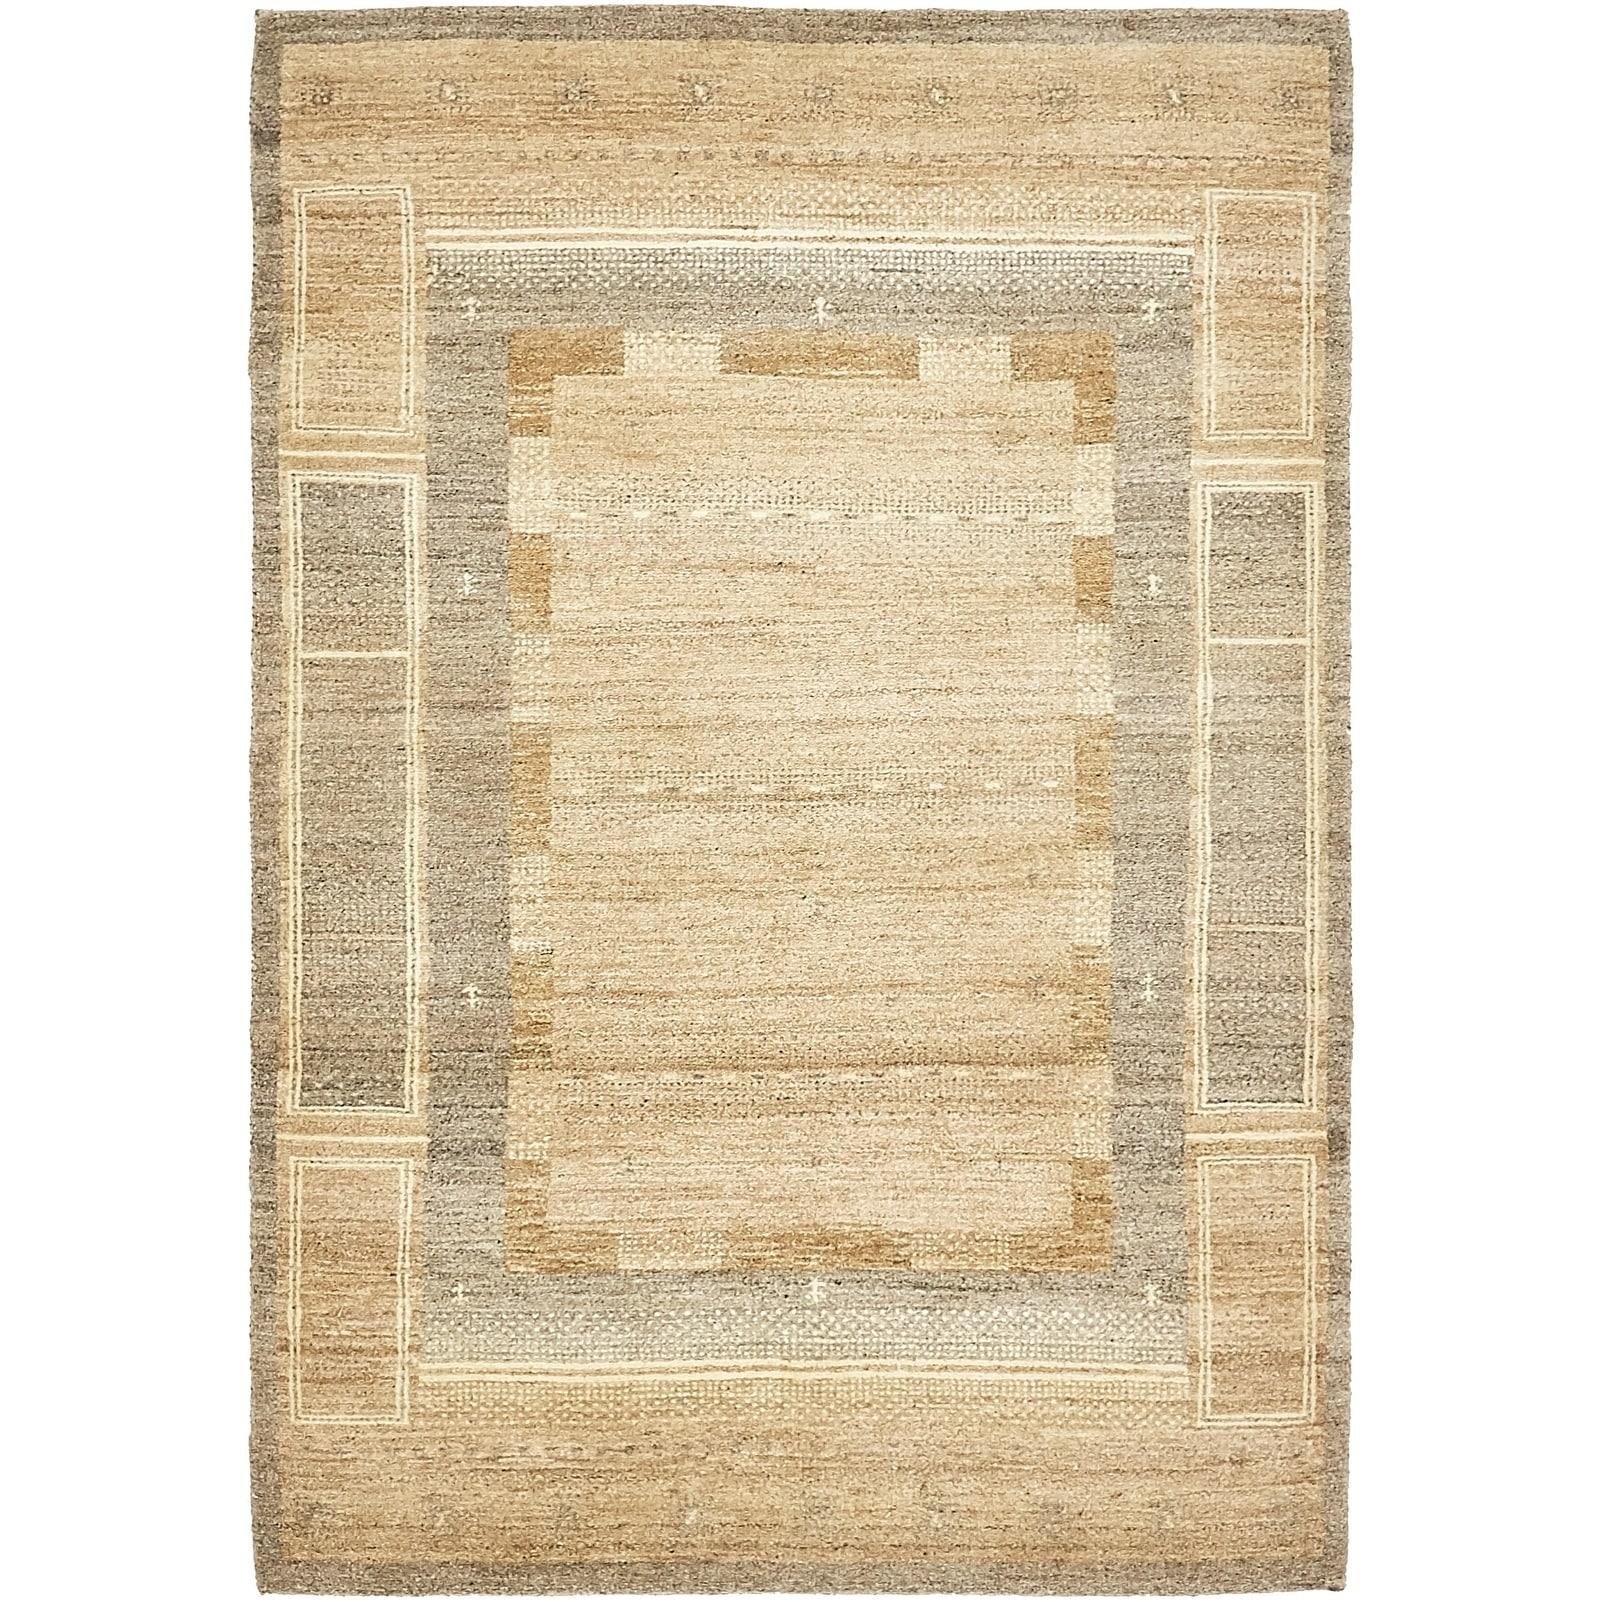 Hand Knotted Kashkuli Gabbeh Wool Area Rug - 4 x 6 (Light brown - 4 x 6)